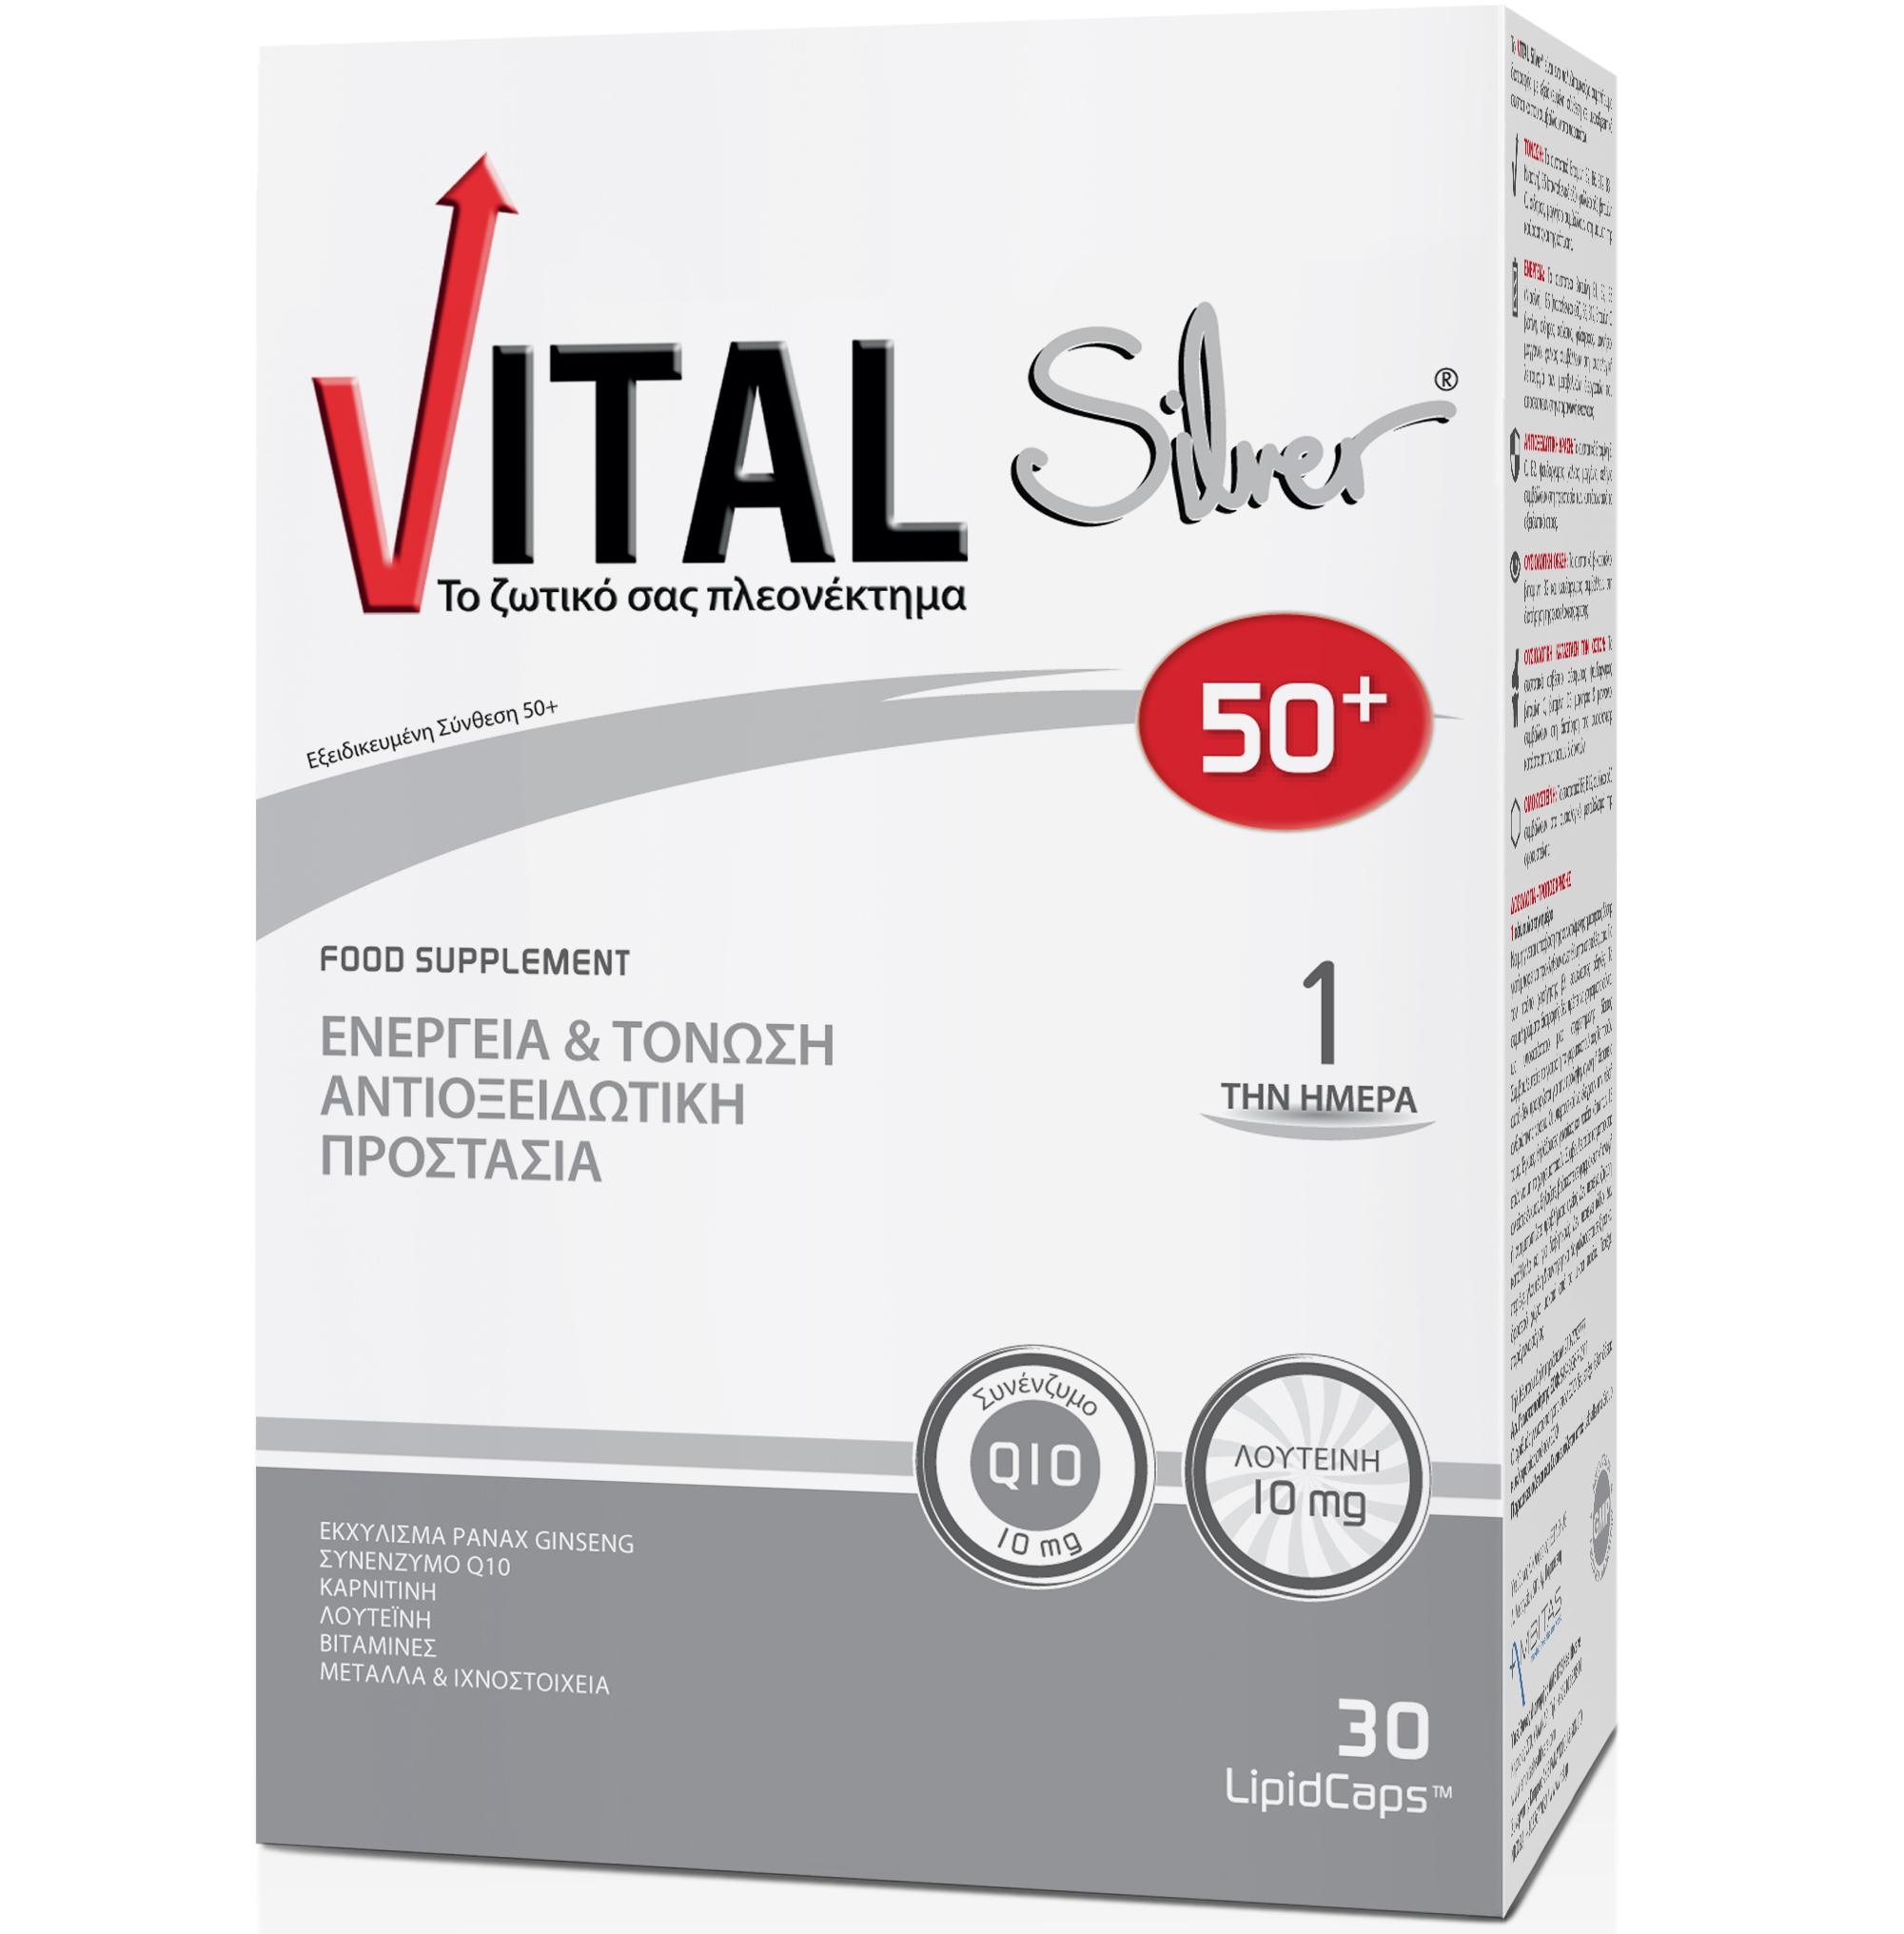 Vital Silver 50+ Πλήρες Και Ισορροπημένο Πολυβιταμινούχο Συμπλήρωμα Διατροφής 30 κάψουλες